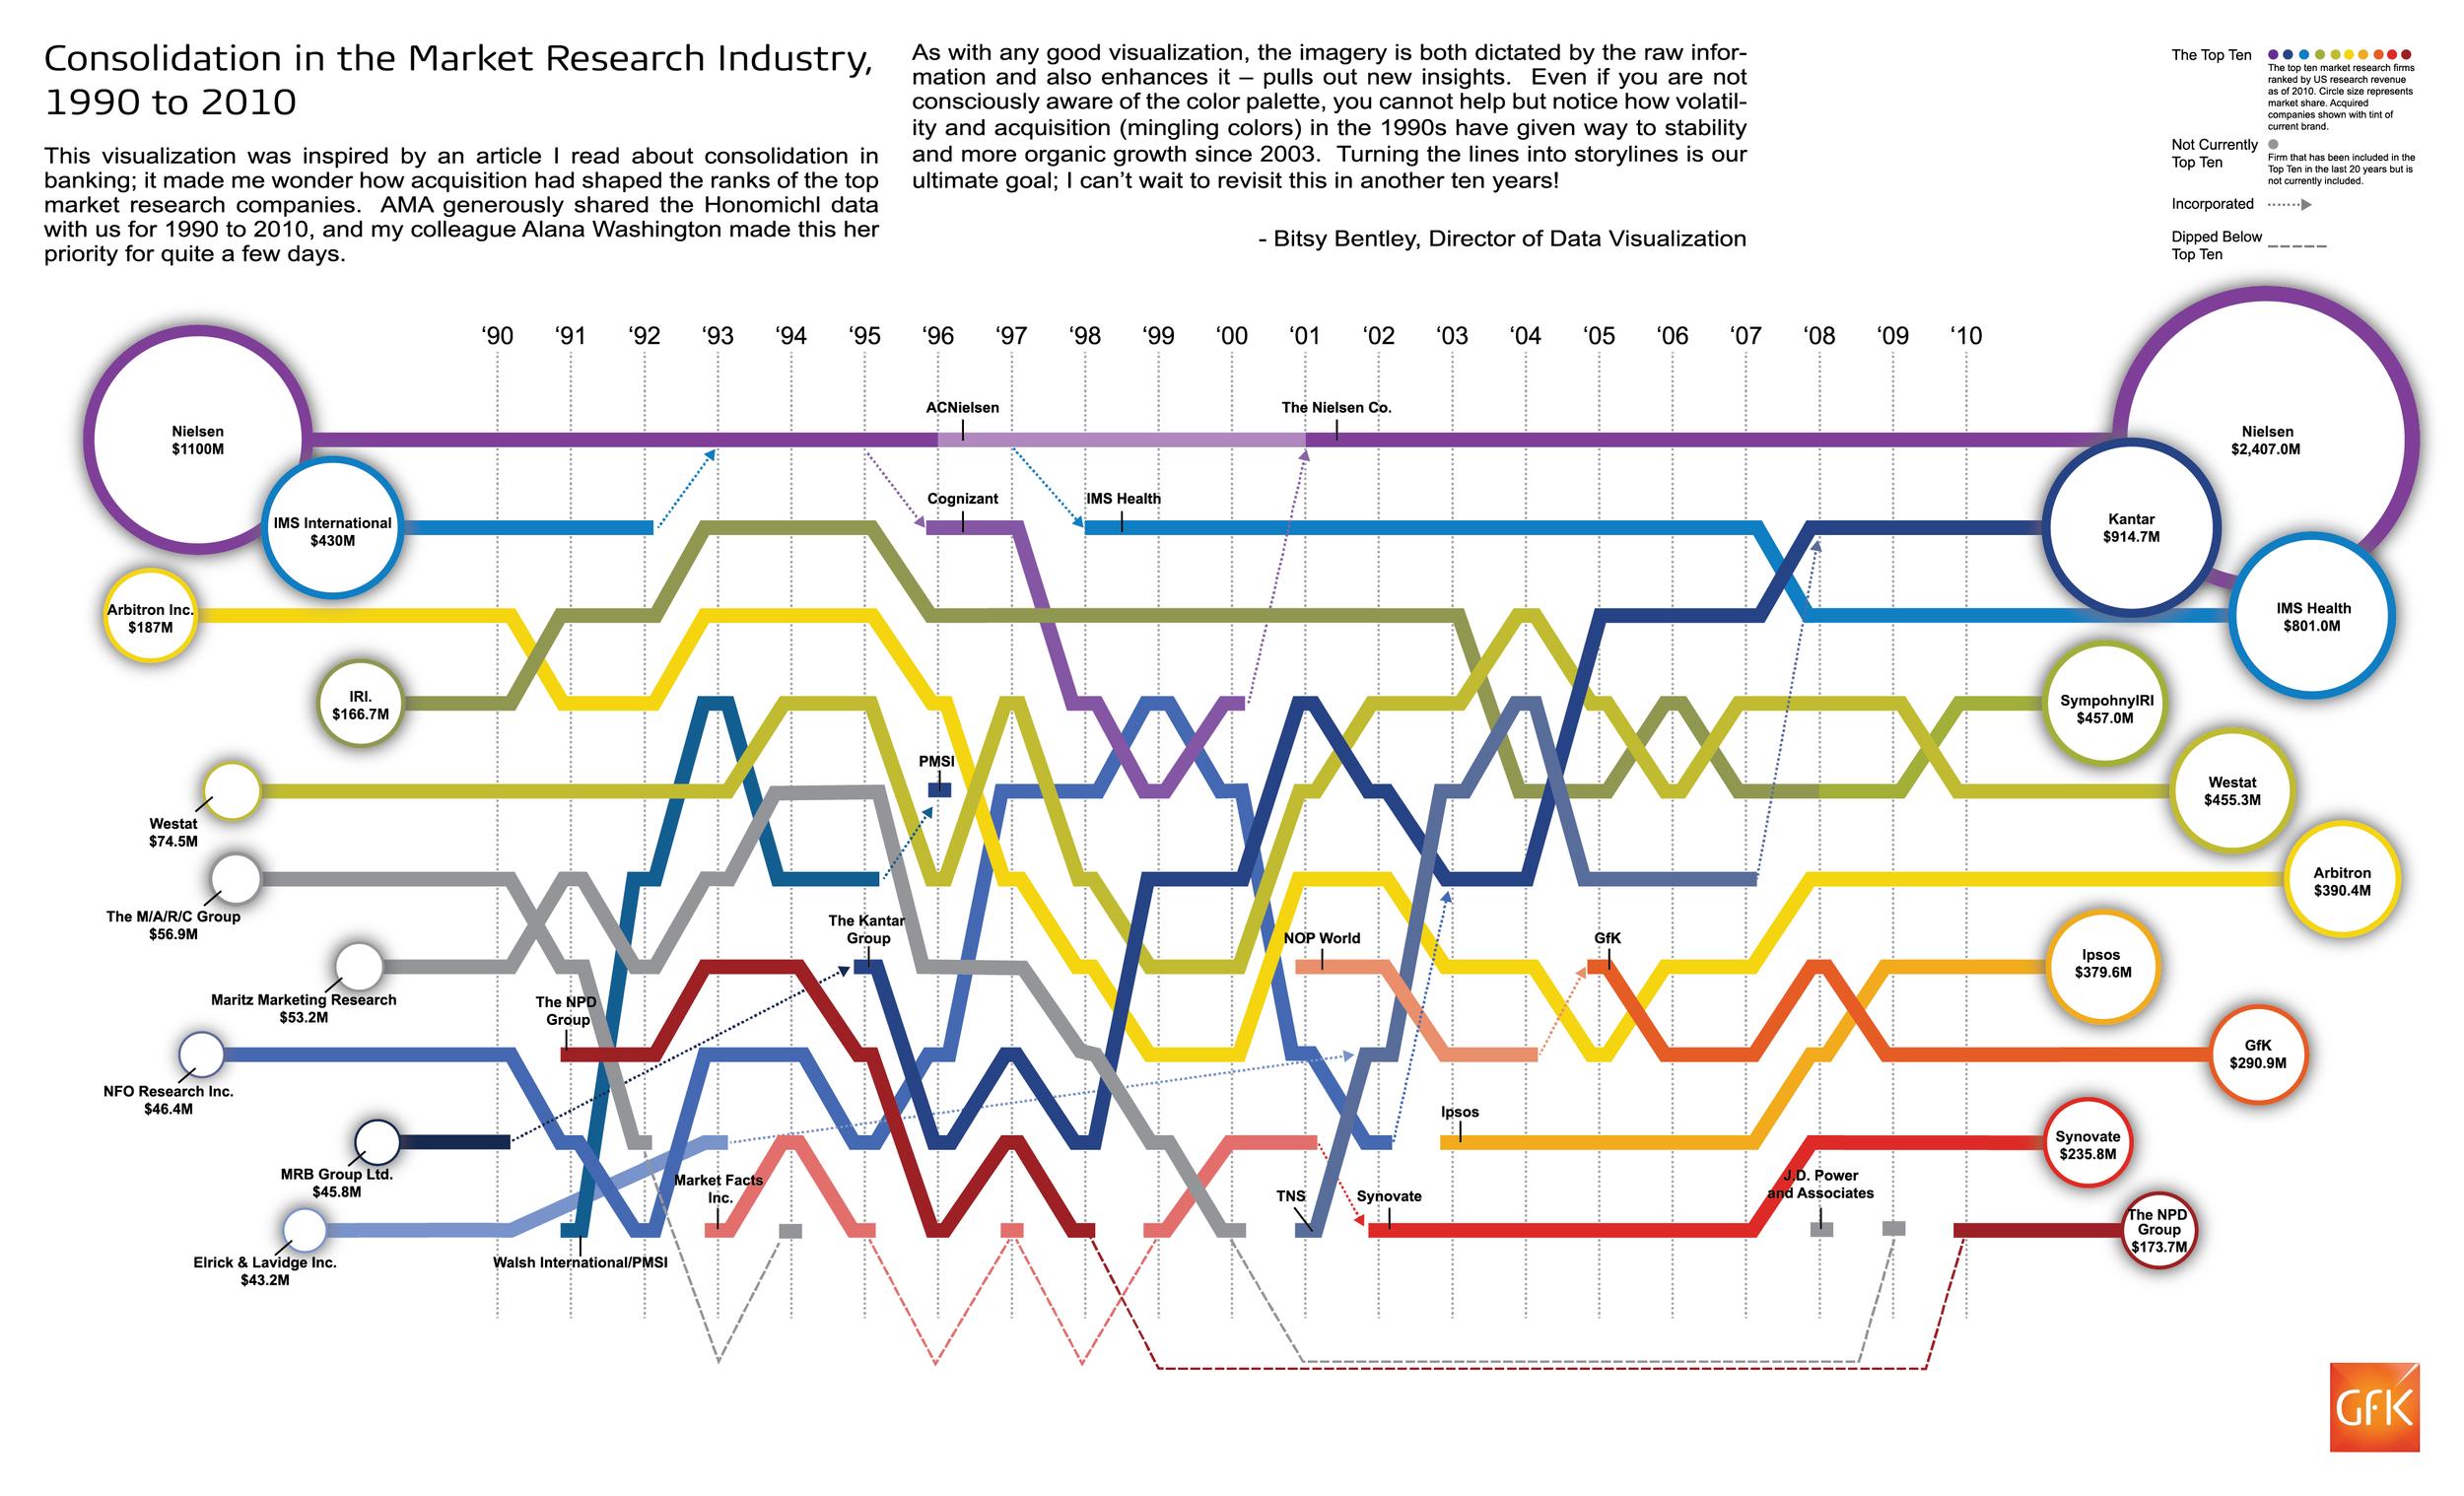 Washington, A. (2012, June). Honomichl Top Ten U.S. Market Research Firms, 1990 to 2010 [Infographic]. Marketing News.